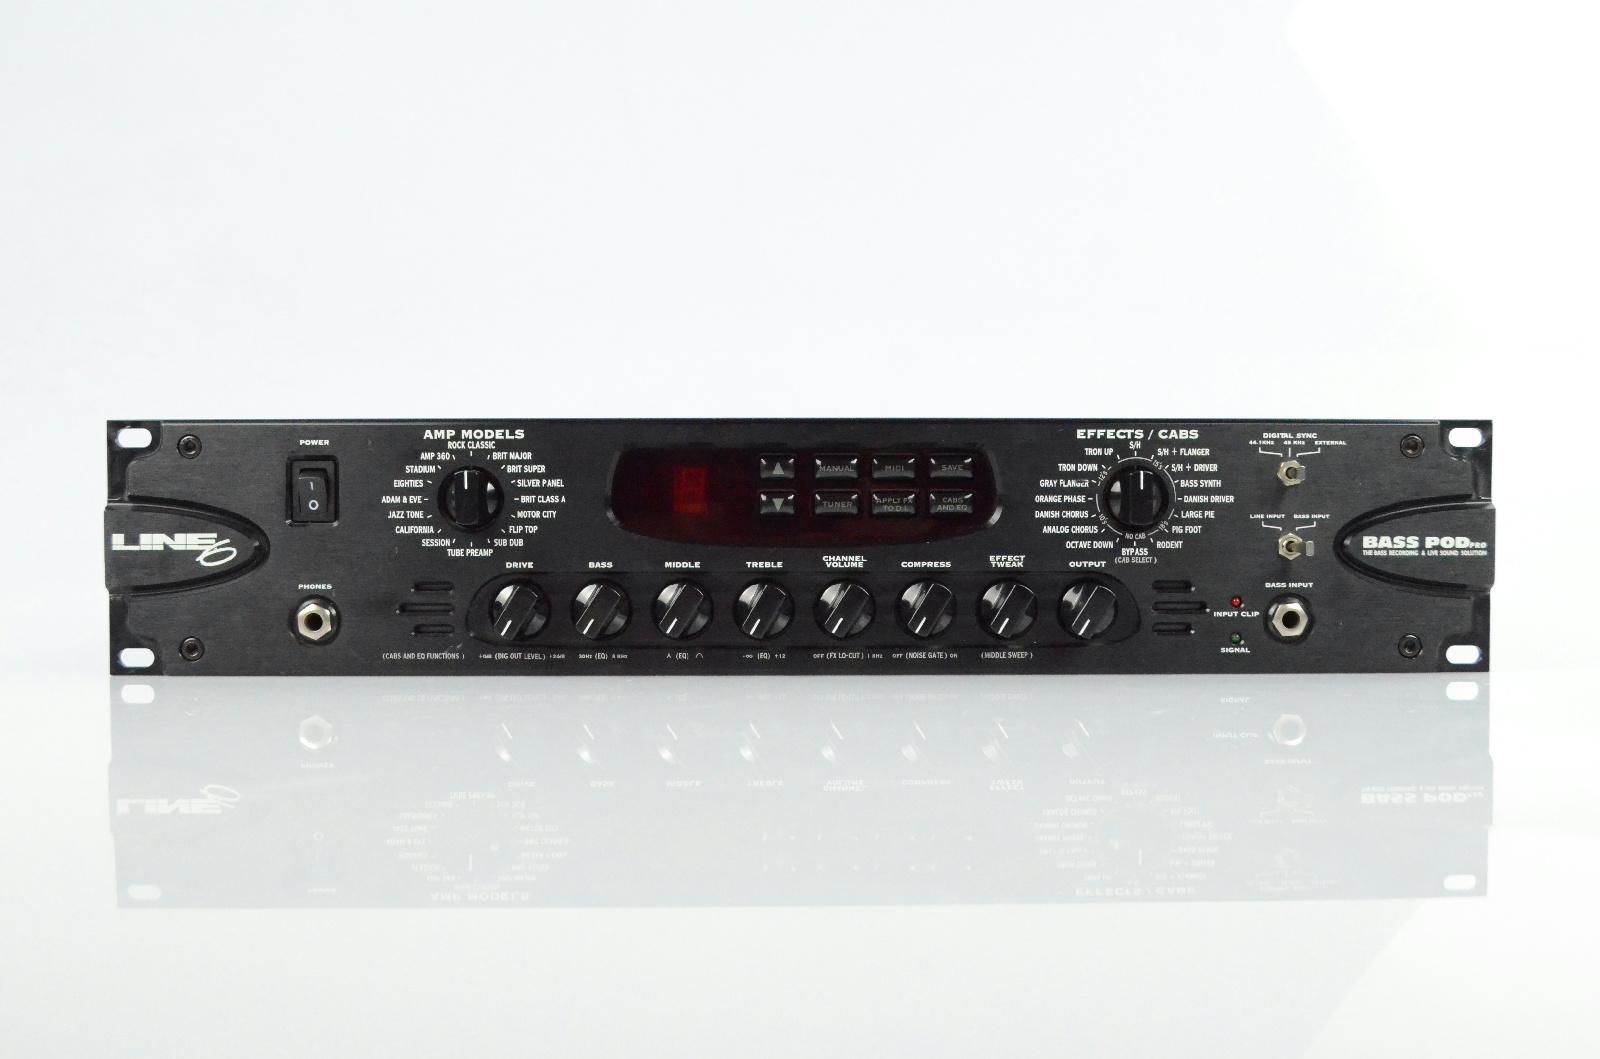 Line 6 Bass Pod Pro Bass Guitar Effects Rack Processor 2U DI AES EBU MIDI #33107